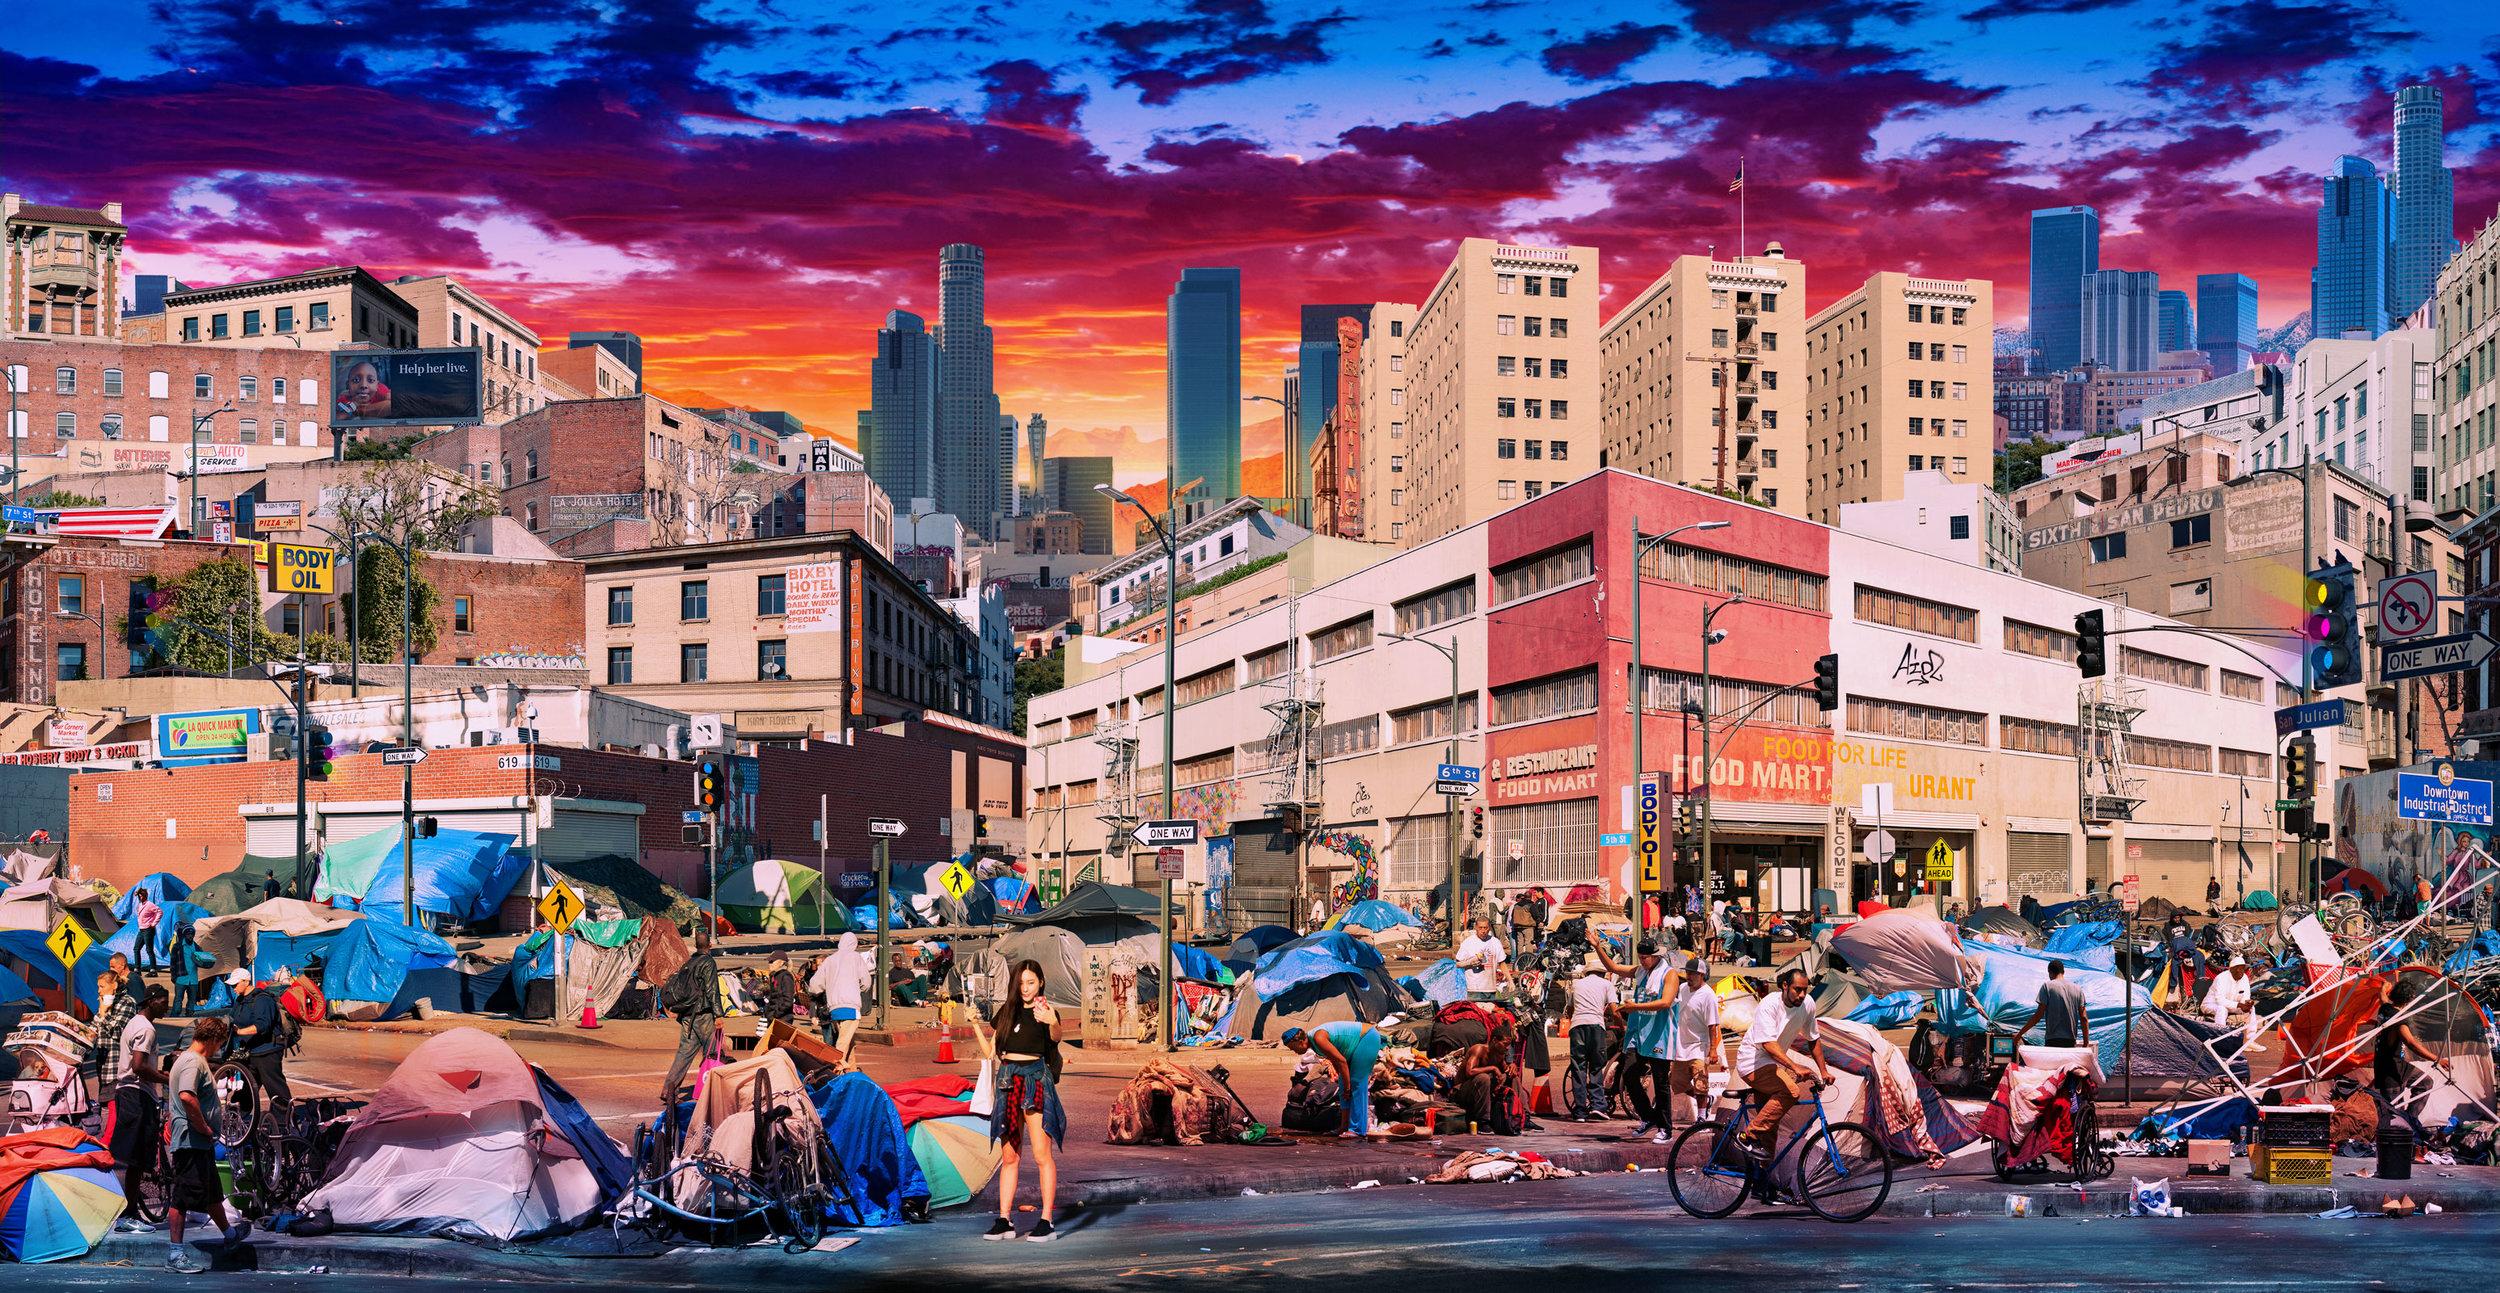 """Skid Row"" Los Angeles, CA"